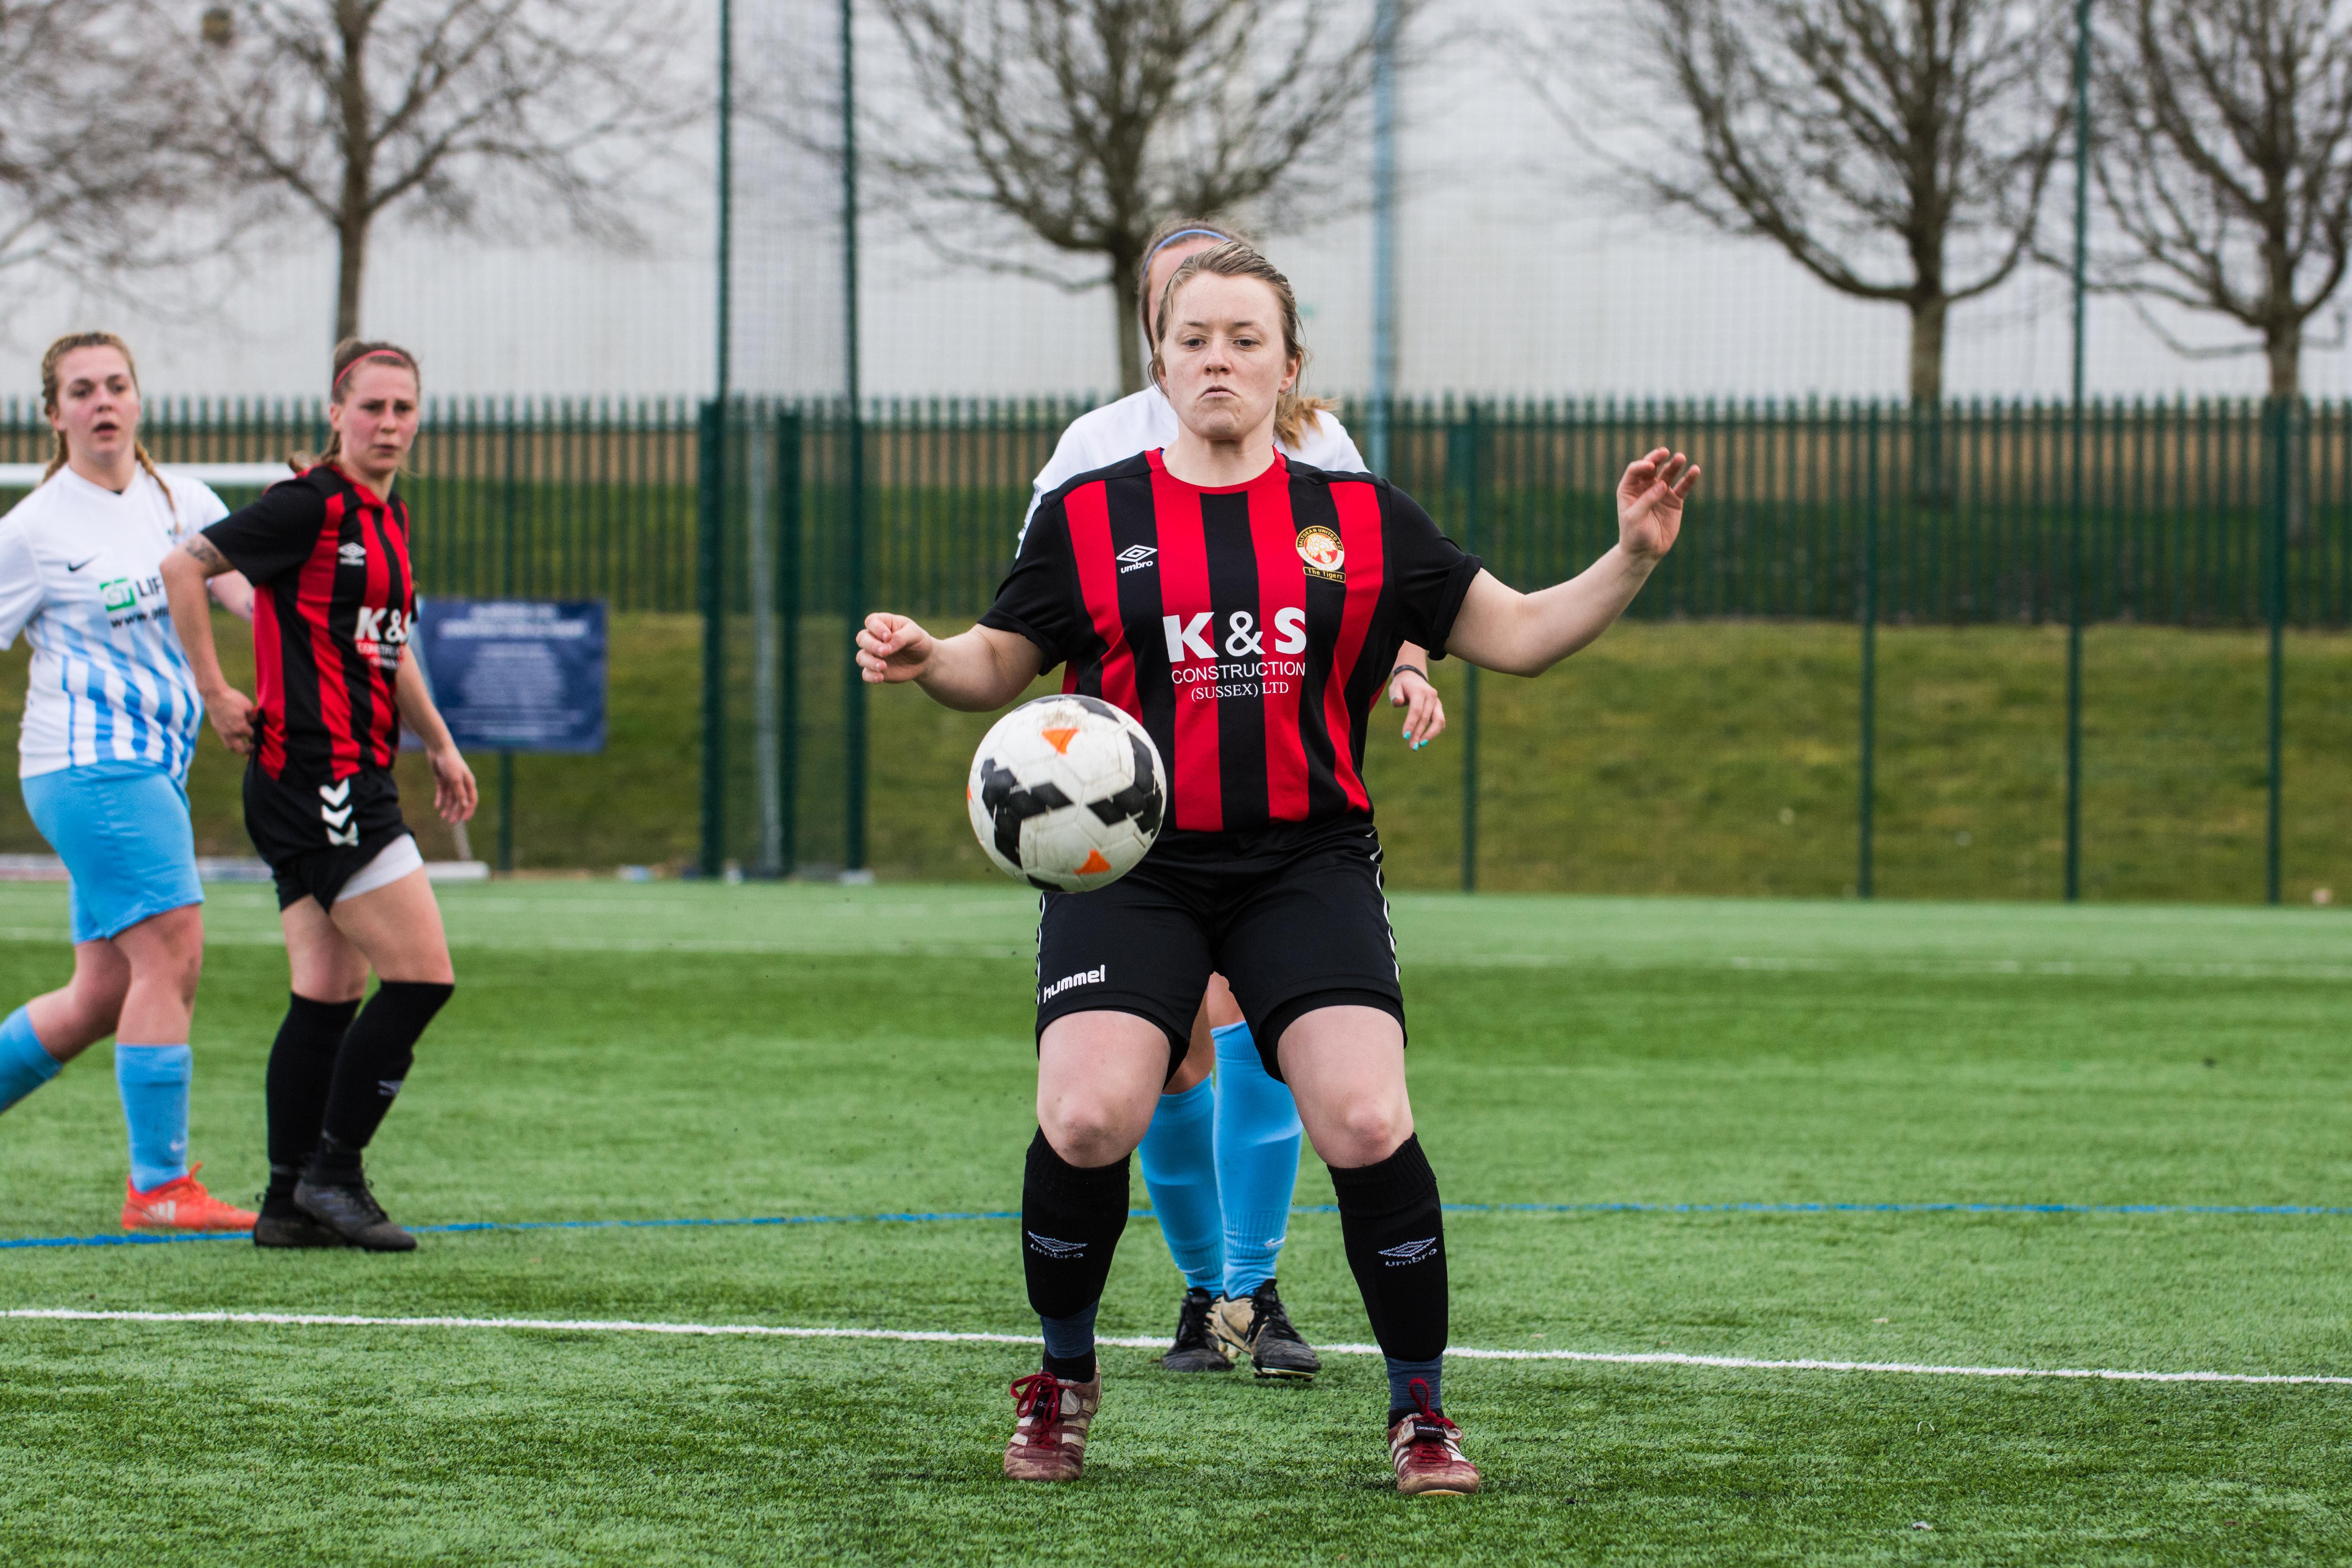 DAVID_JEFFERY Saltdean Utd Ladies FC vs Worthing Utd Ladies FC 11.03.18 42